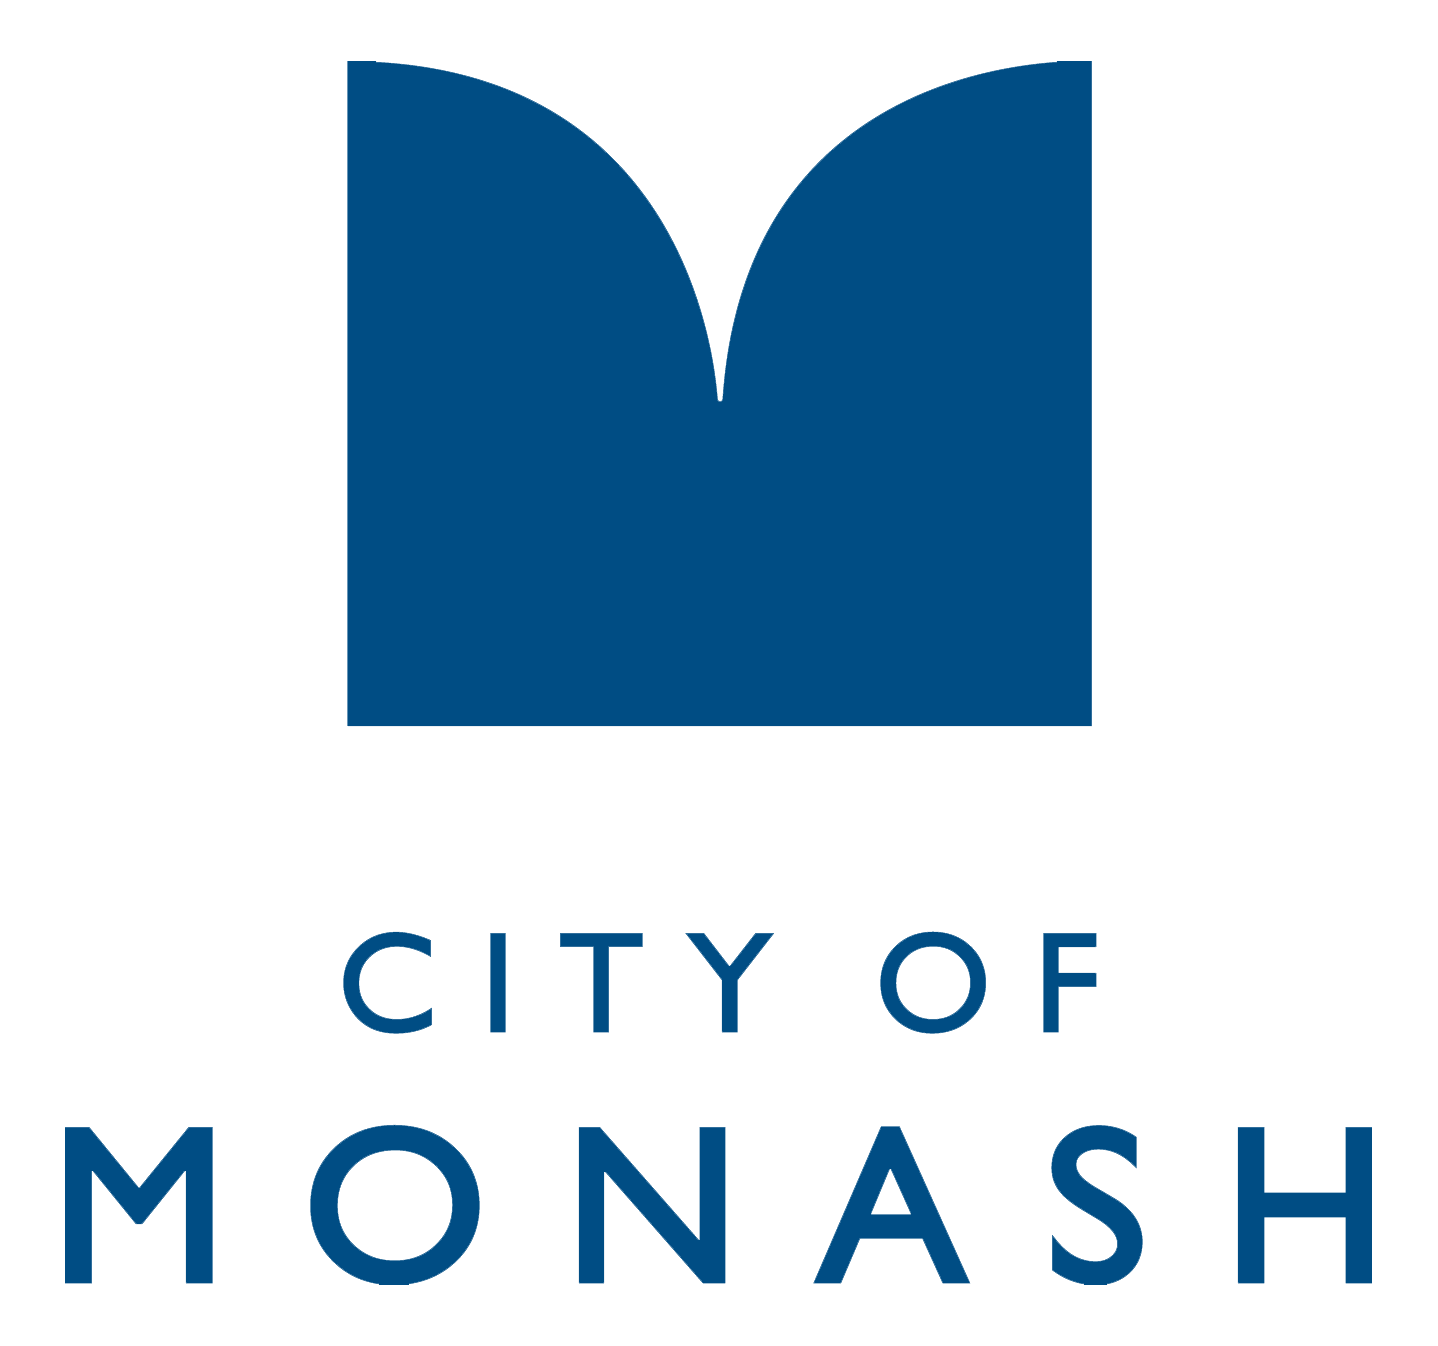 Monash Women's Business Network